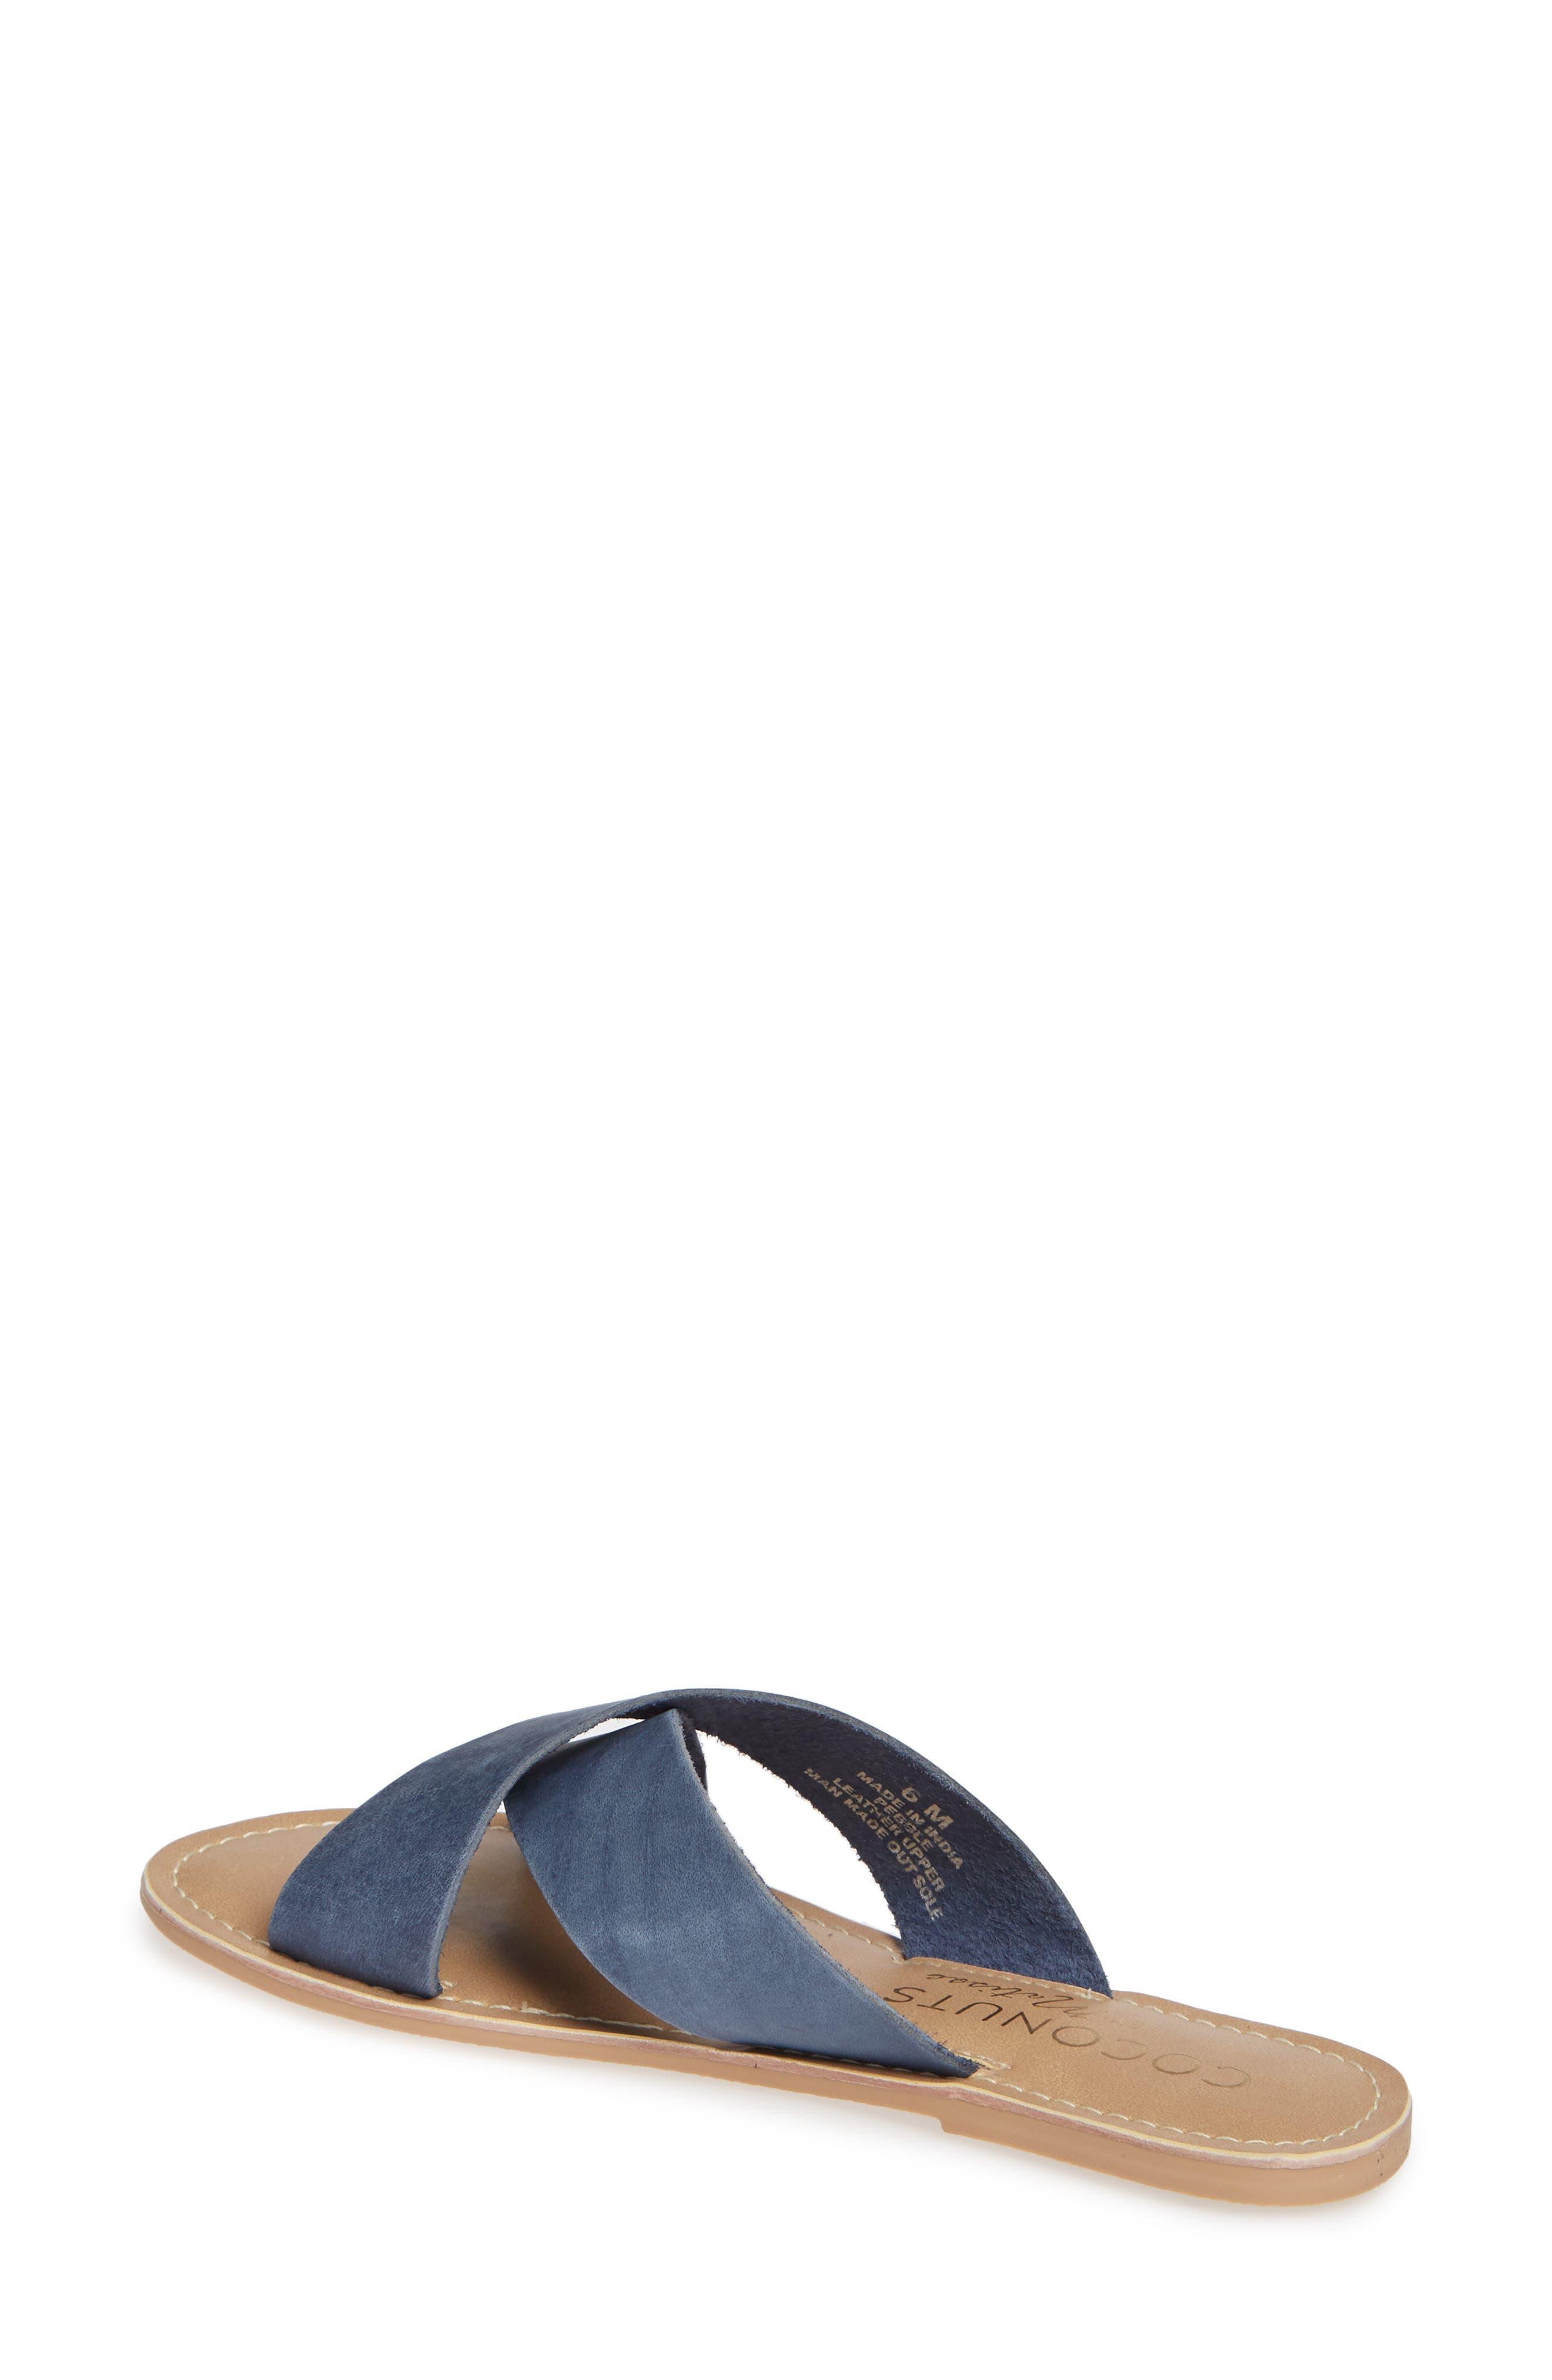 COCONUTS BY MATISSE, Pebble Slide Sandal, Alternate thumbnail 2, color, BLUE NUBUCK LEATHER